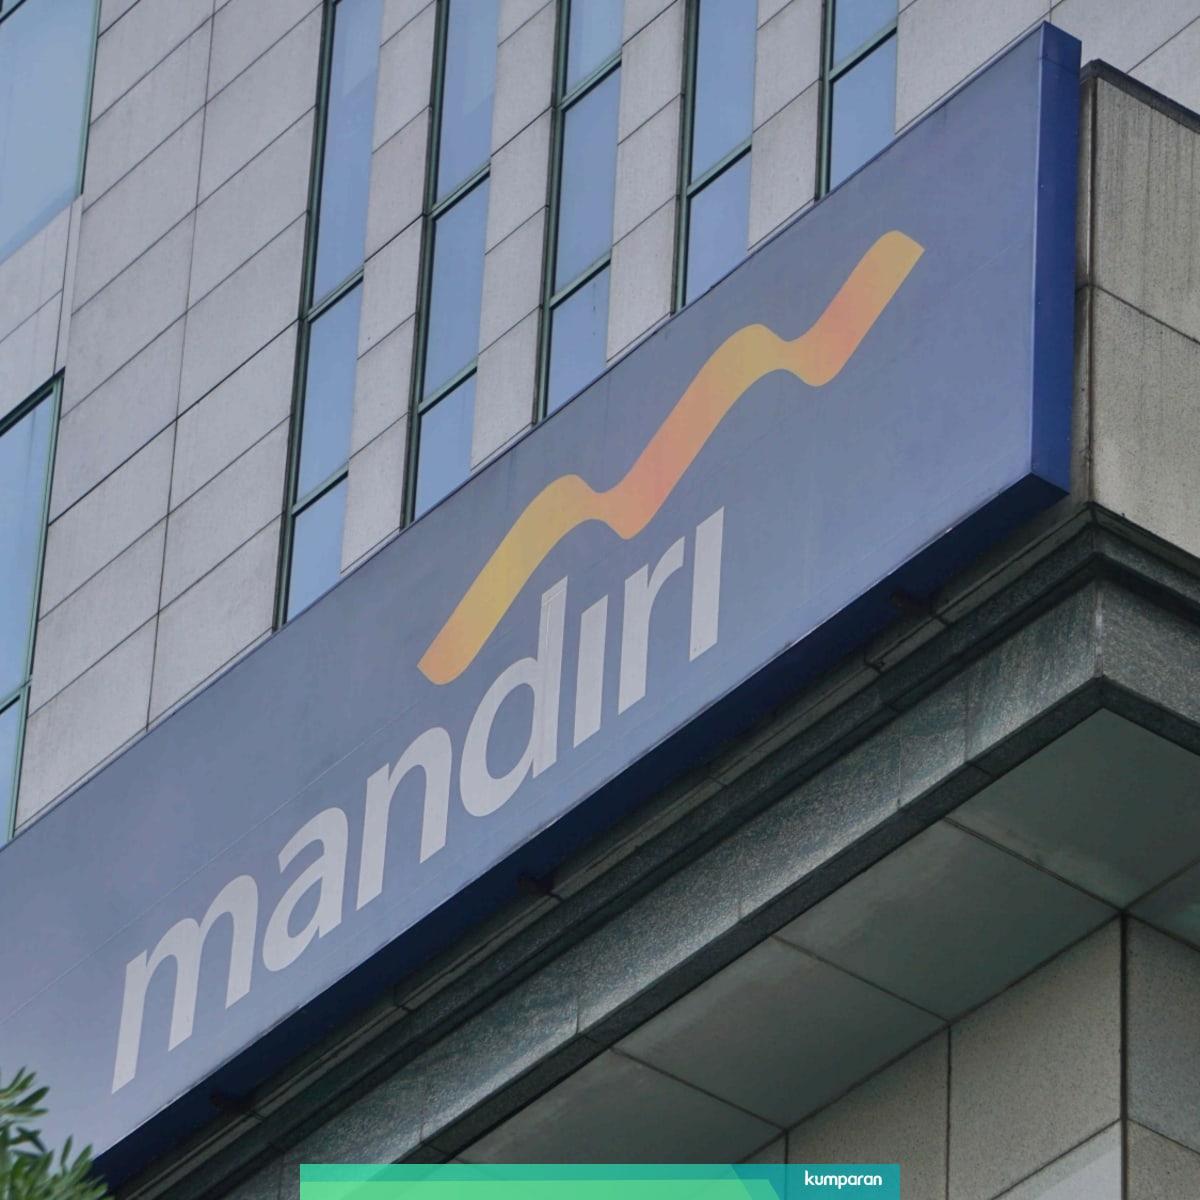 Bank Mandiri Sediakan Layanan Pembukaan Rekening Secara Online Kumparan Com